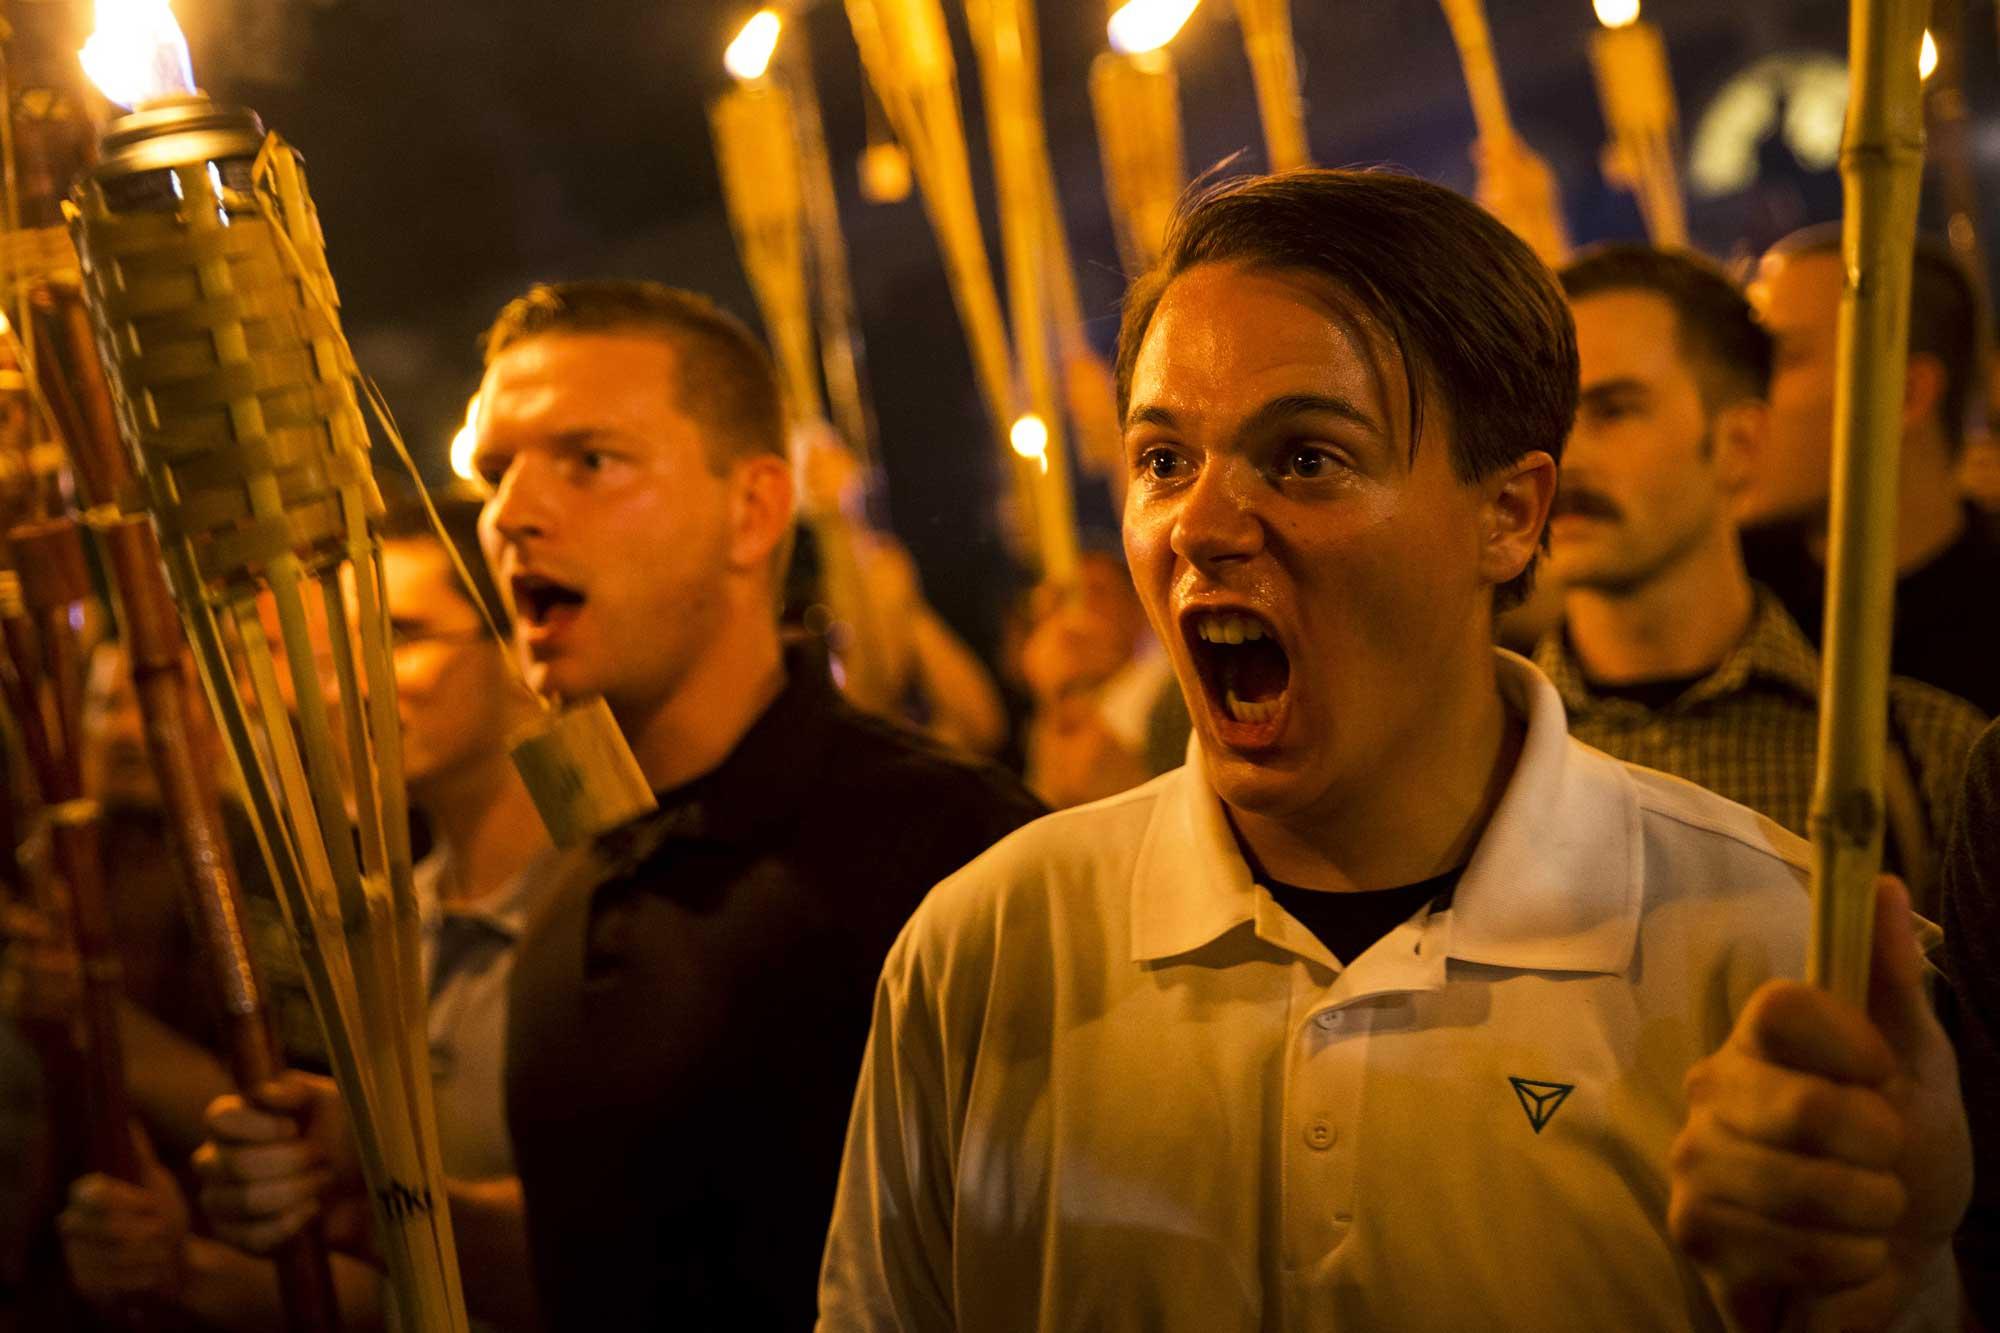 FBI arrests three alleged neo-Nazis ahead of Virginia gun rally